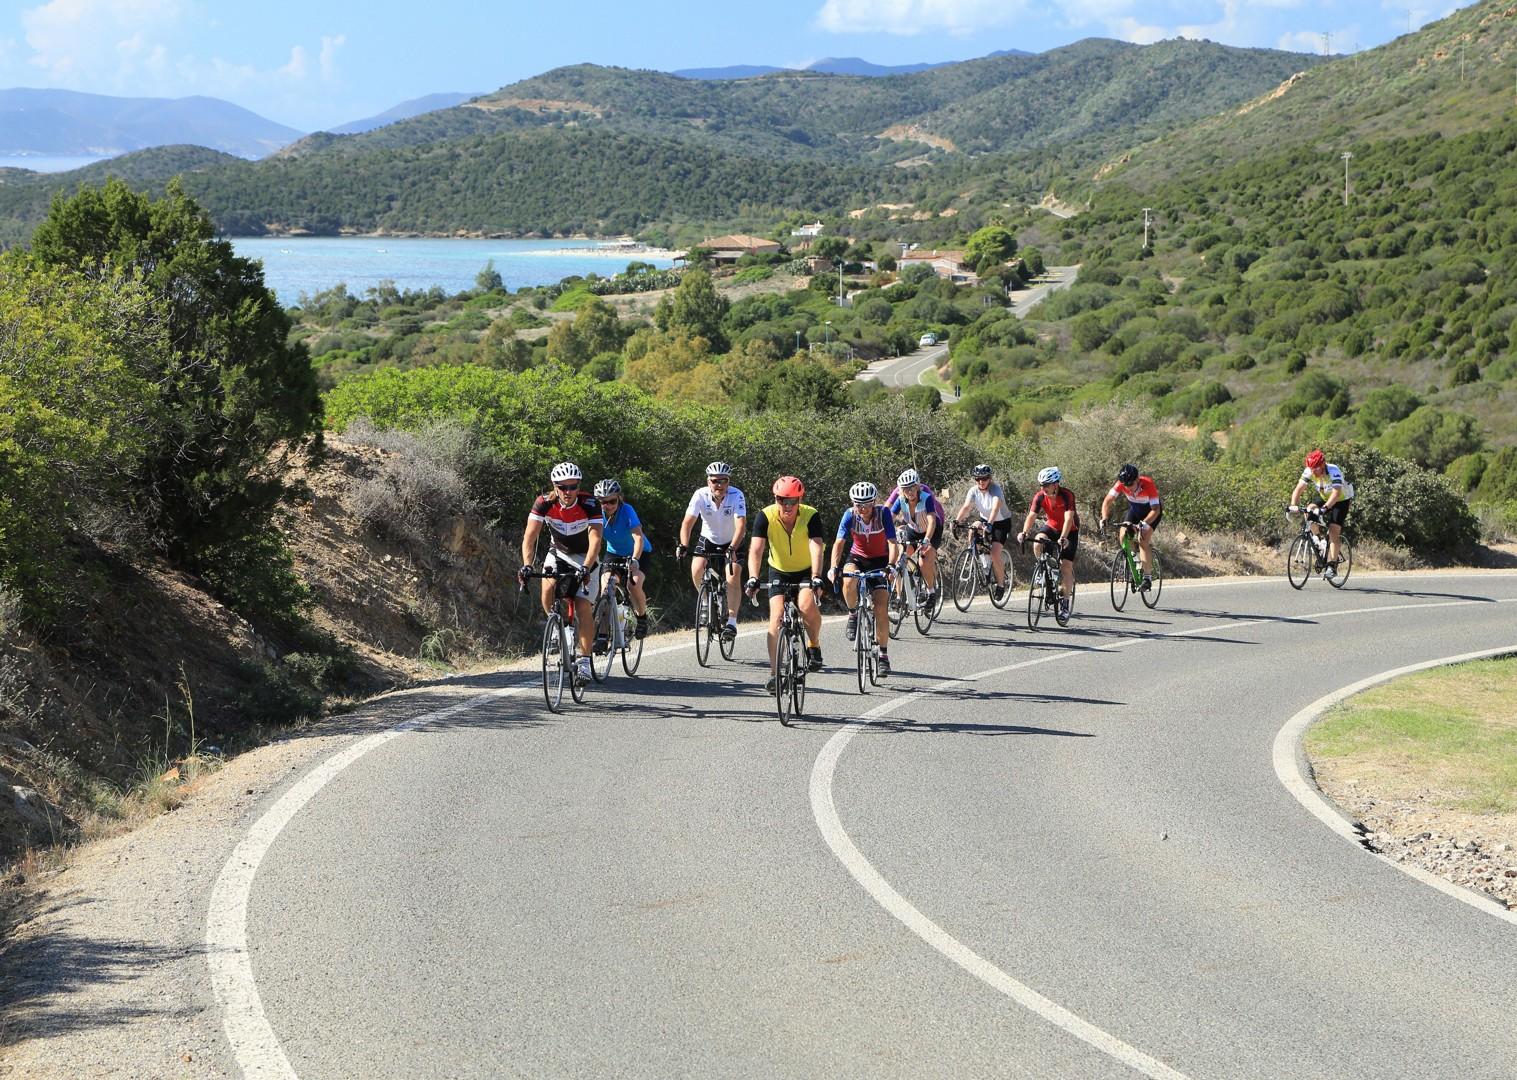 Guided-Road-Cycling-Holiday-Coastal-Explorer-Sardinia-Pan-di-Zucchero.jpg - Italy - Sardinia - Coastal Explorer - Road Cycling